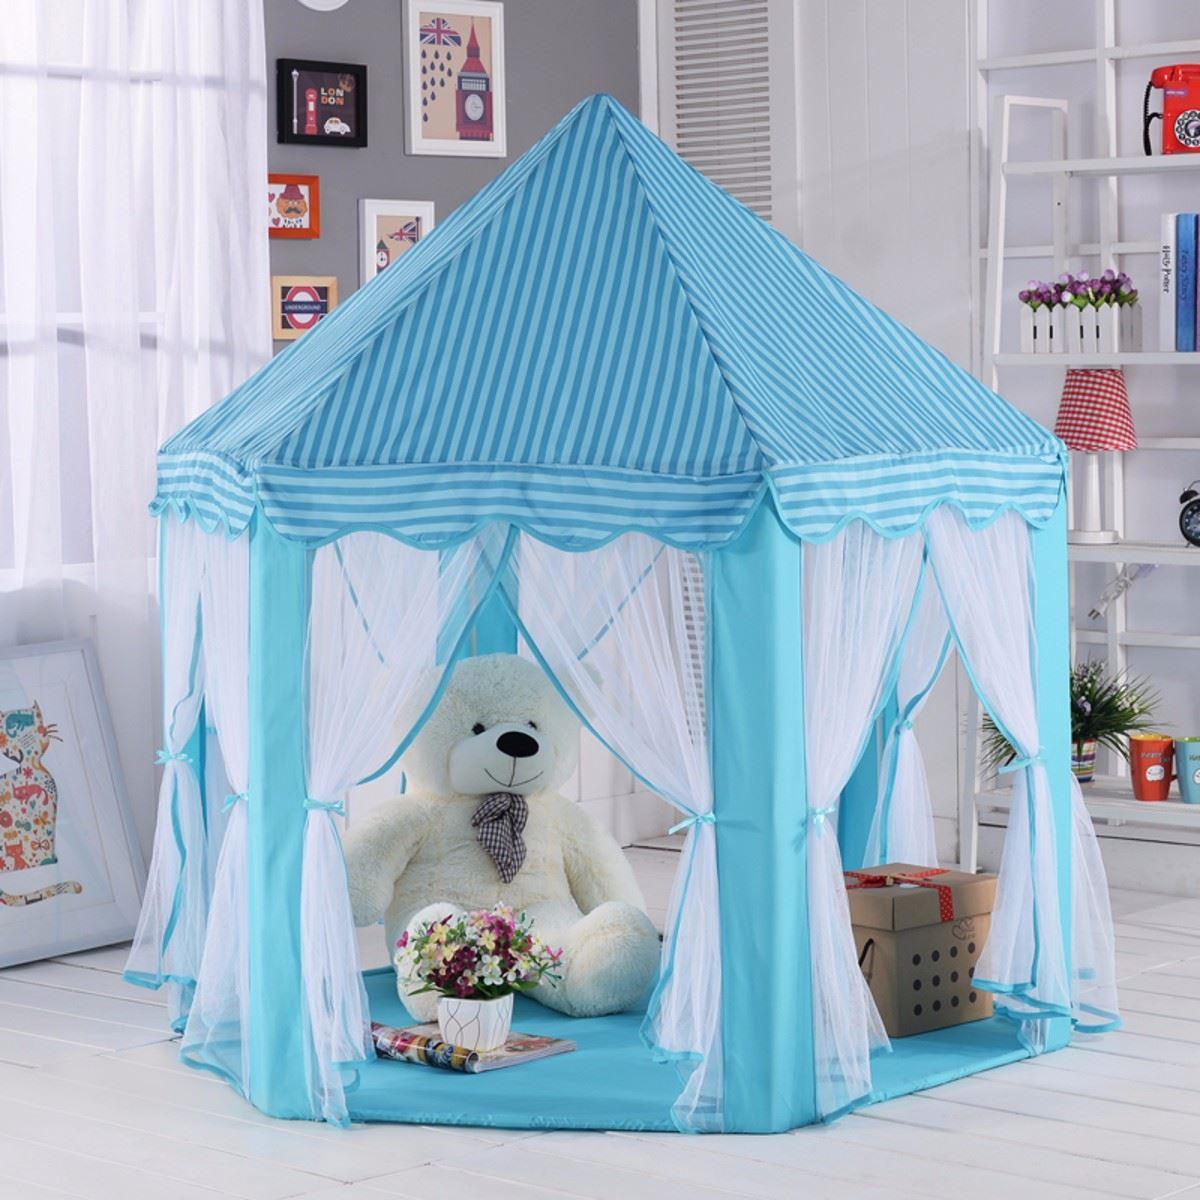 Activity Fairy House Portable Princess Castle Play Tent